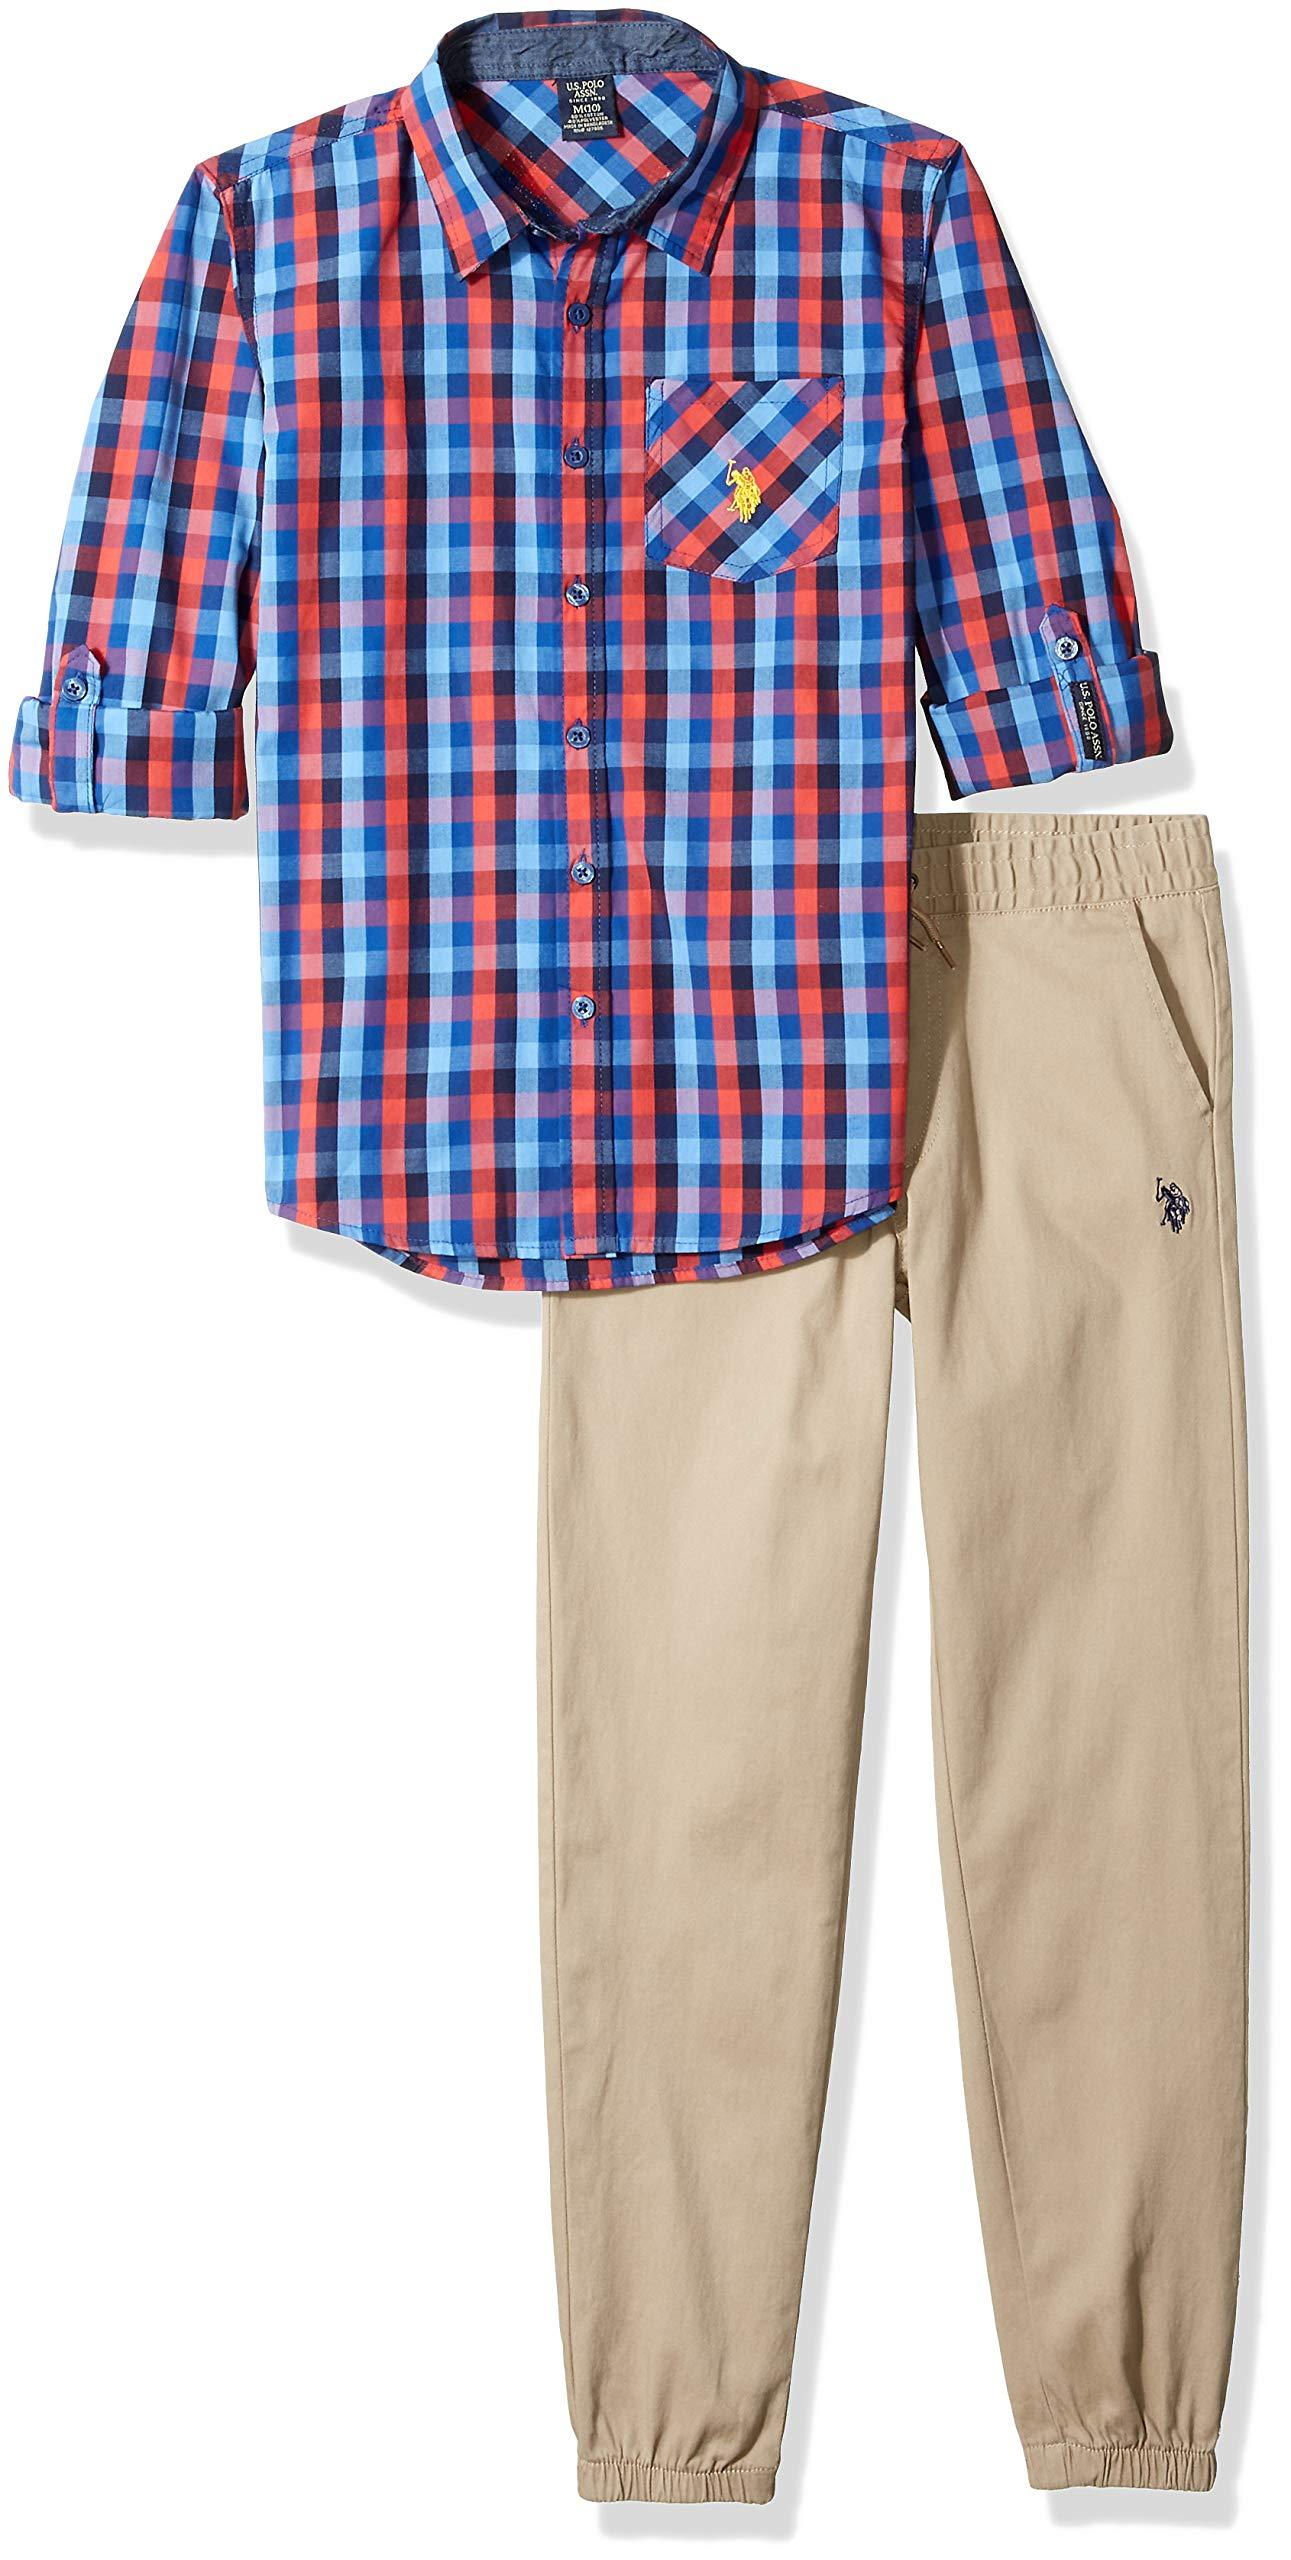 U.S. Polo Assn. Boys' Big Long Sleeve Shirt and Pant Set, red/Blue Multi Plaid, 8